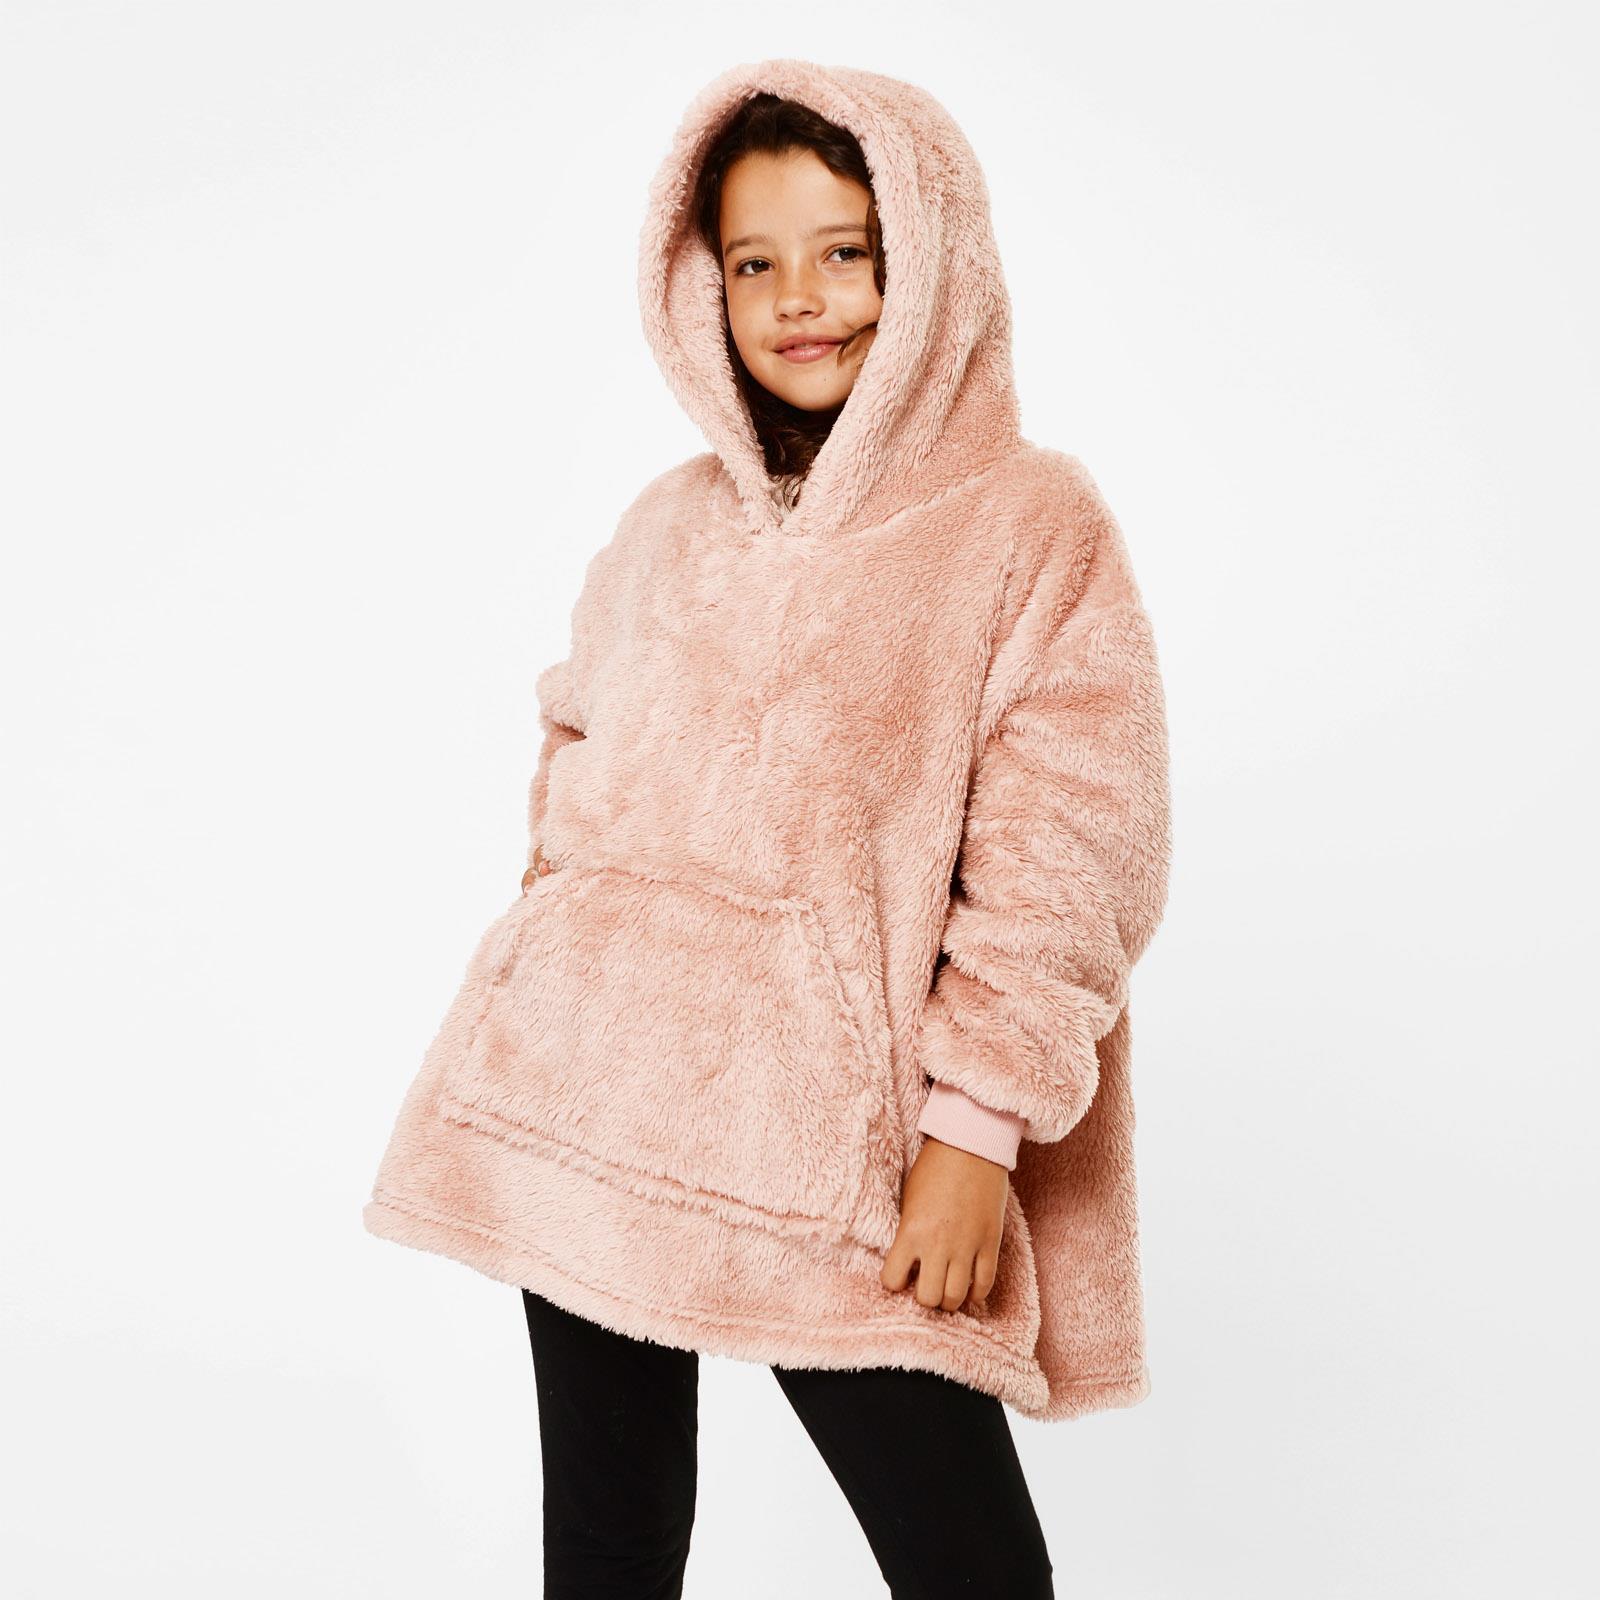 thumbnail 15 - Brentfords-Teddy-Fleece-Hoodie-Blanket-Oversized-Giant-Wearable-Adults-Kids-UK